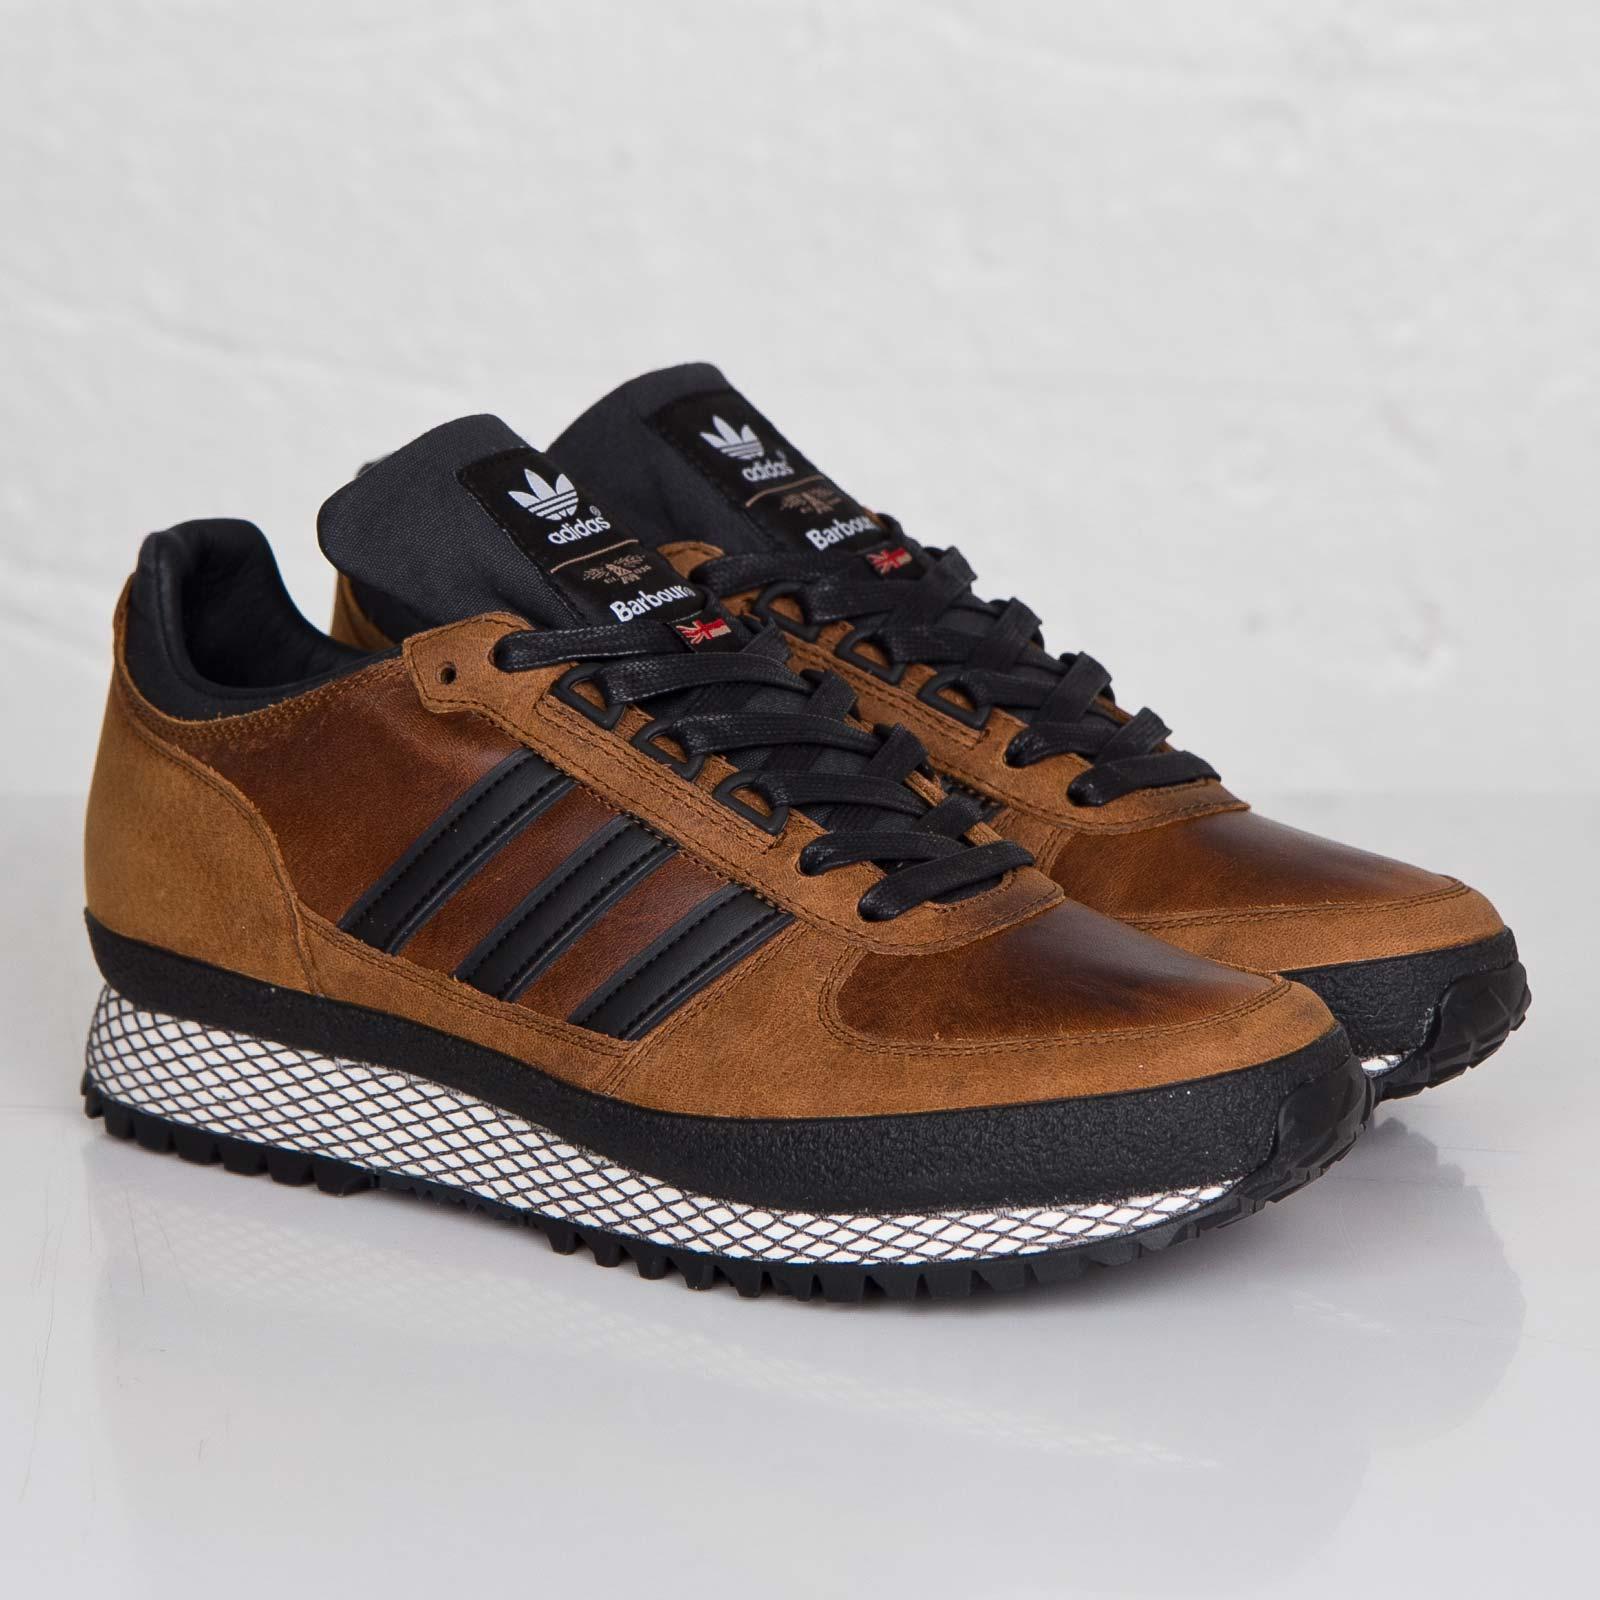 adidas ts runner barbour b41241 sneakersnstuff scarpe